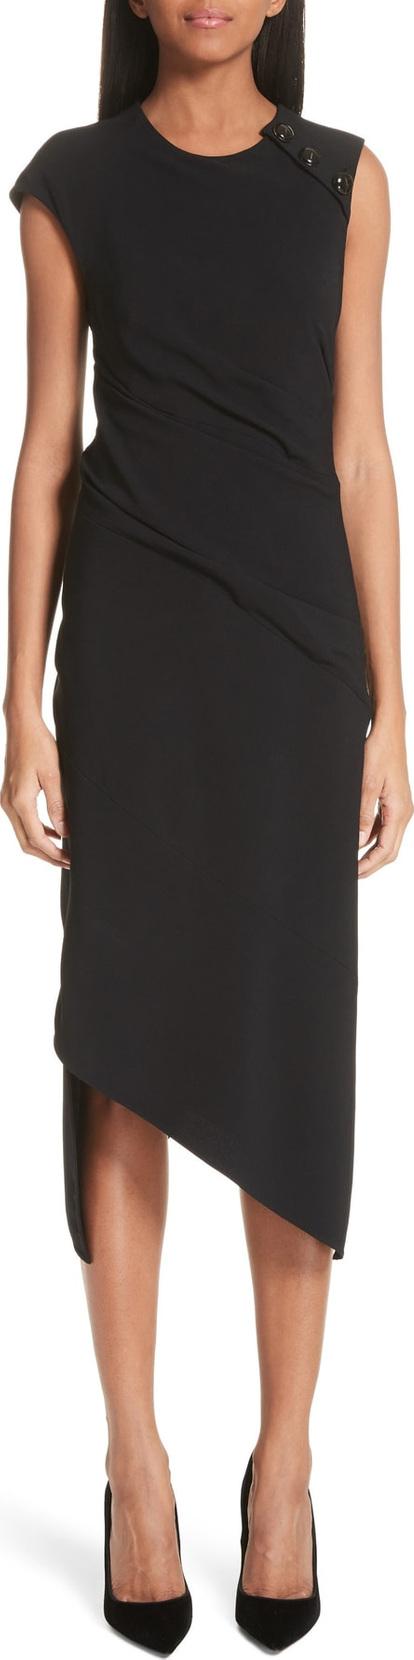 Proenza Schouler Spiral Detail Asymmetrical Crepe Dress